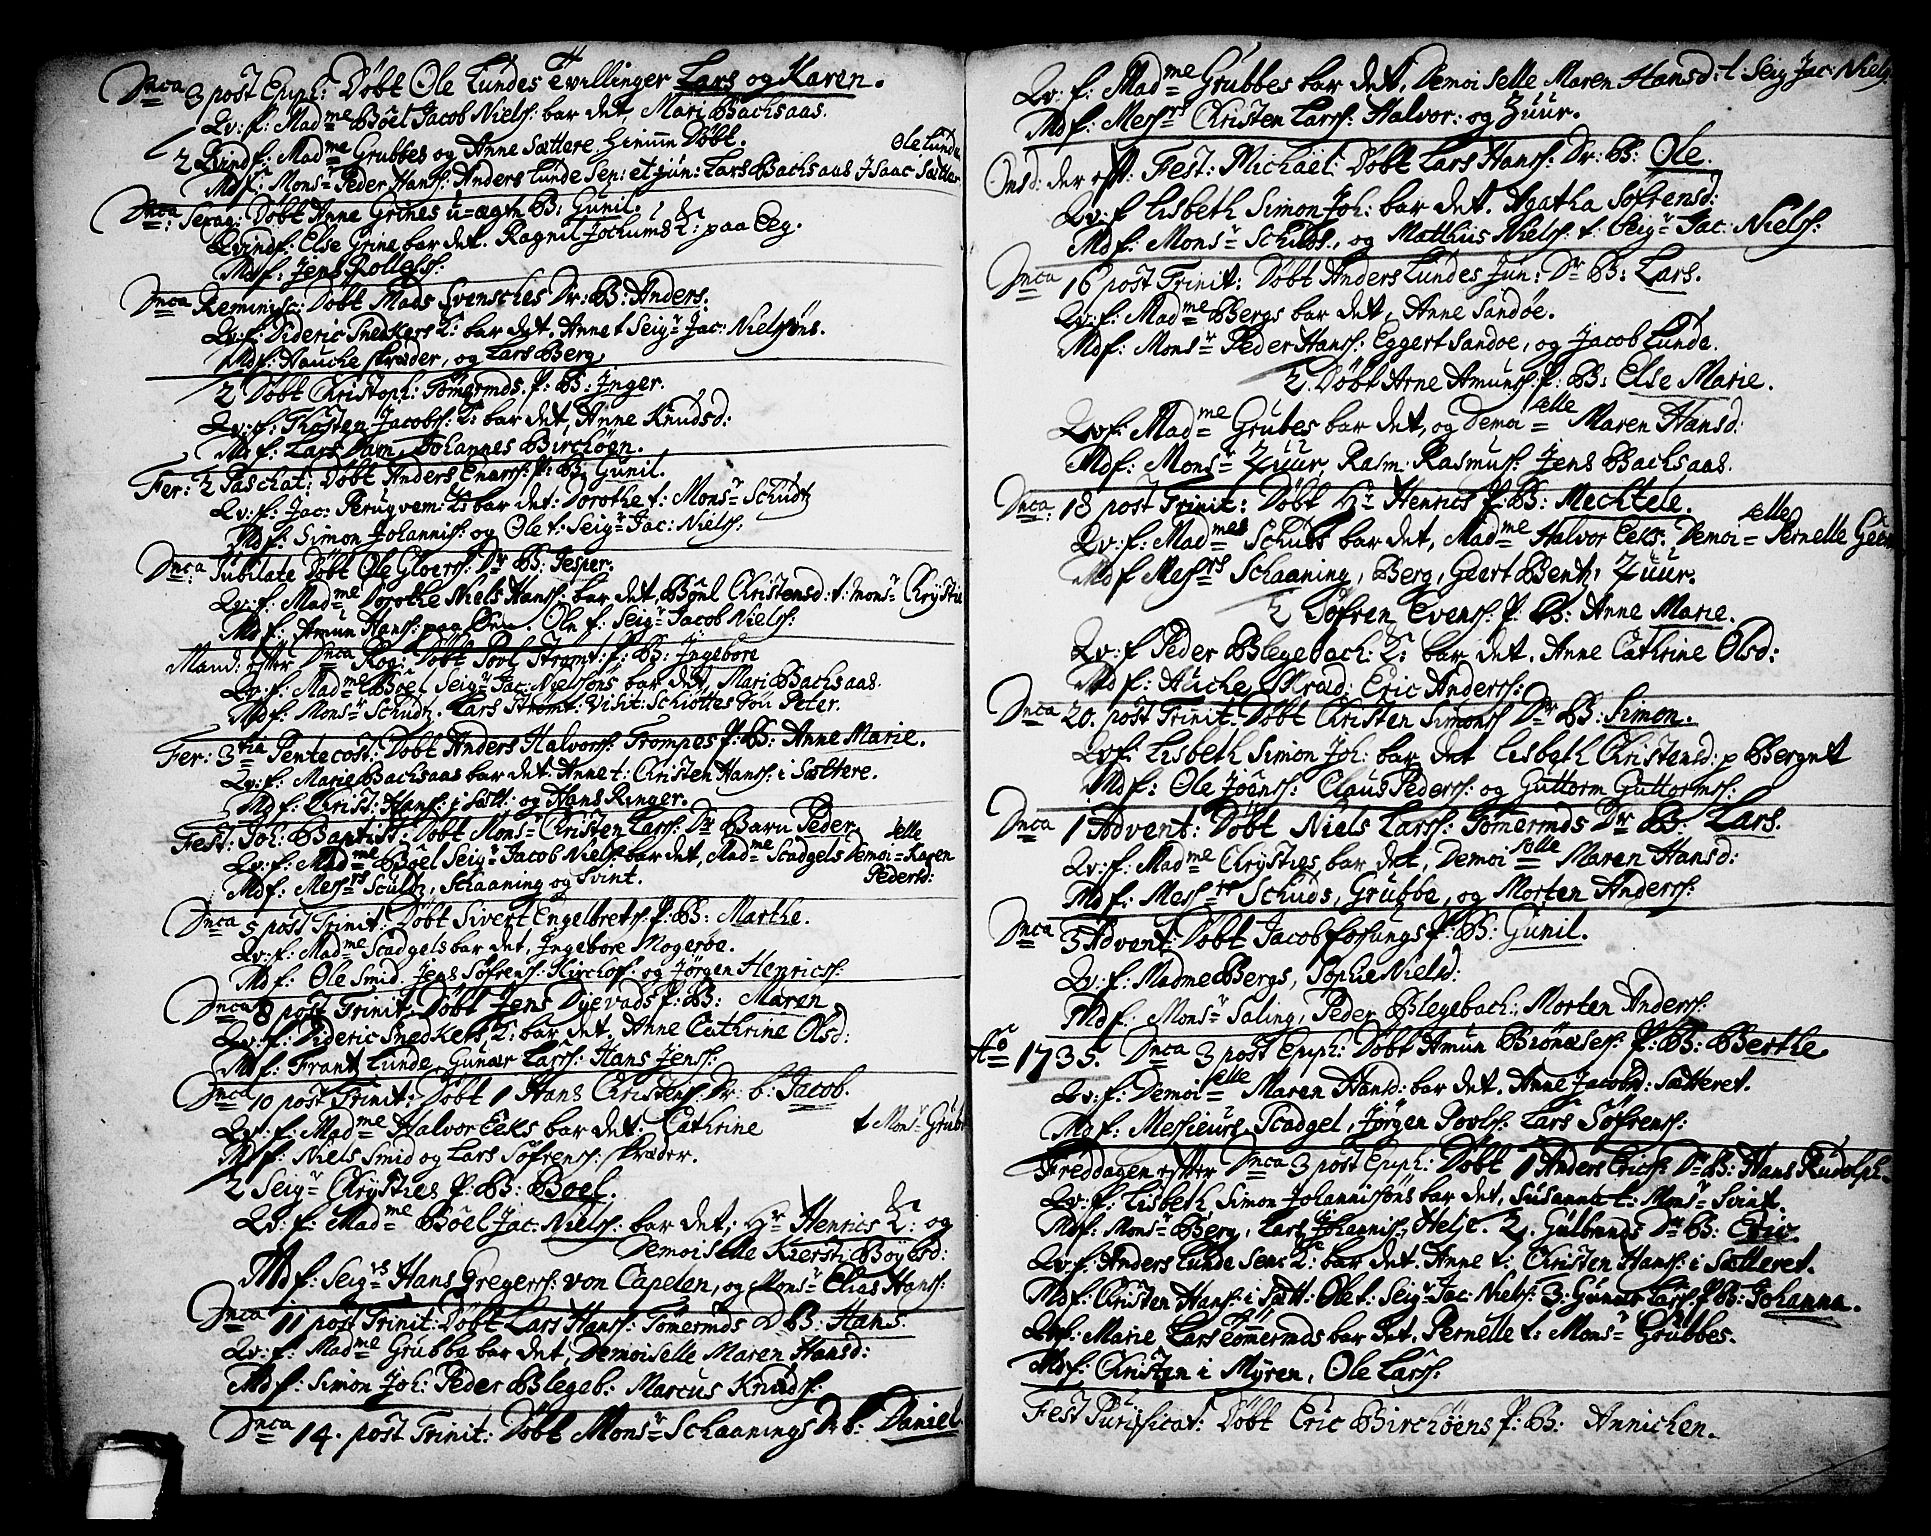 SAKO, Brevik kirkebøker, F/Fa/L0002: Ministerialbok nr. 2, 1720-1764, s. 34e